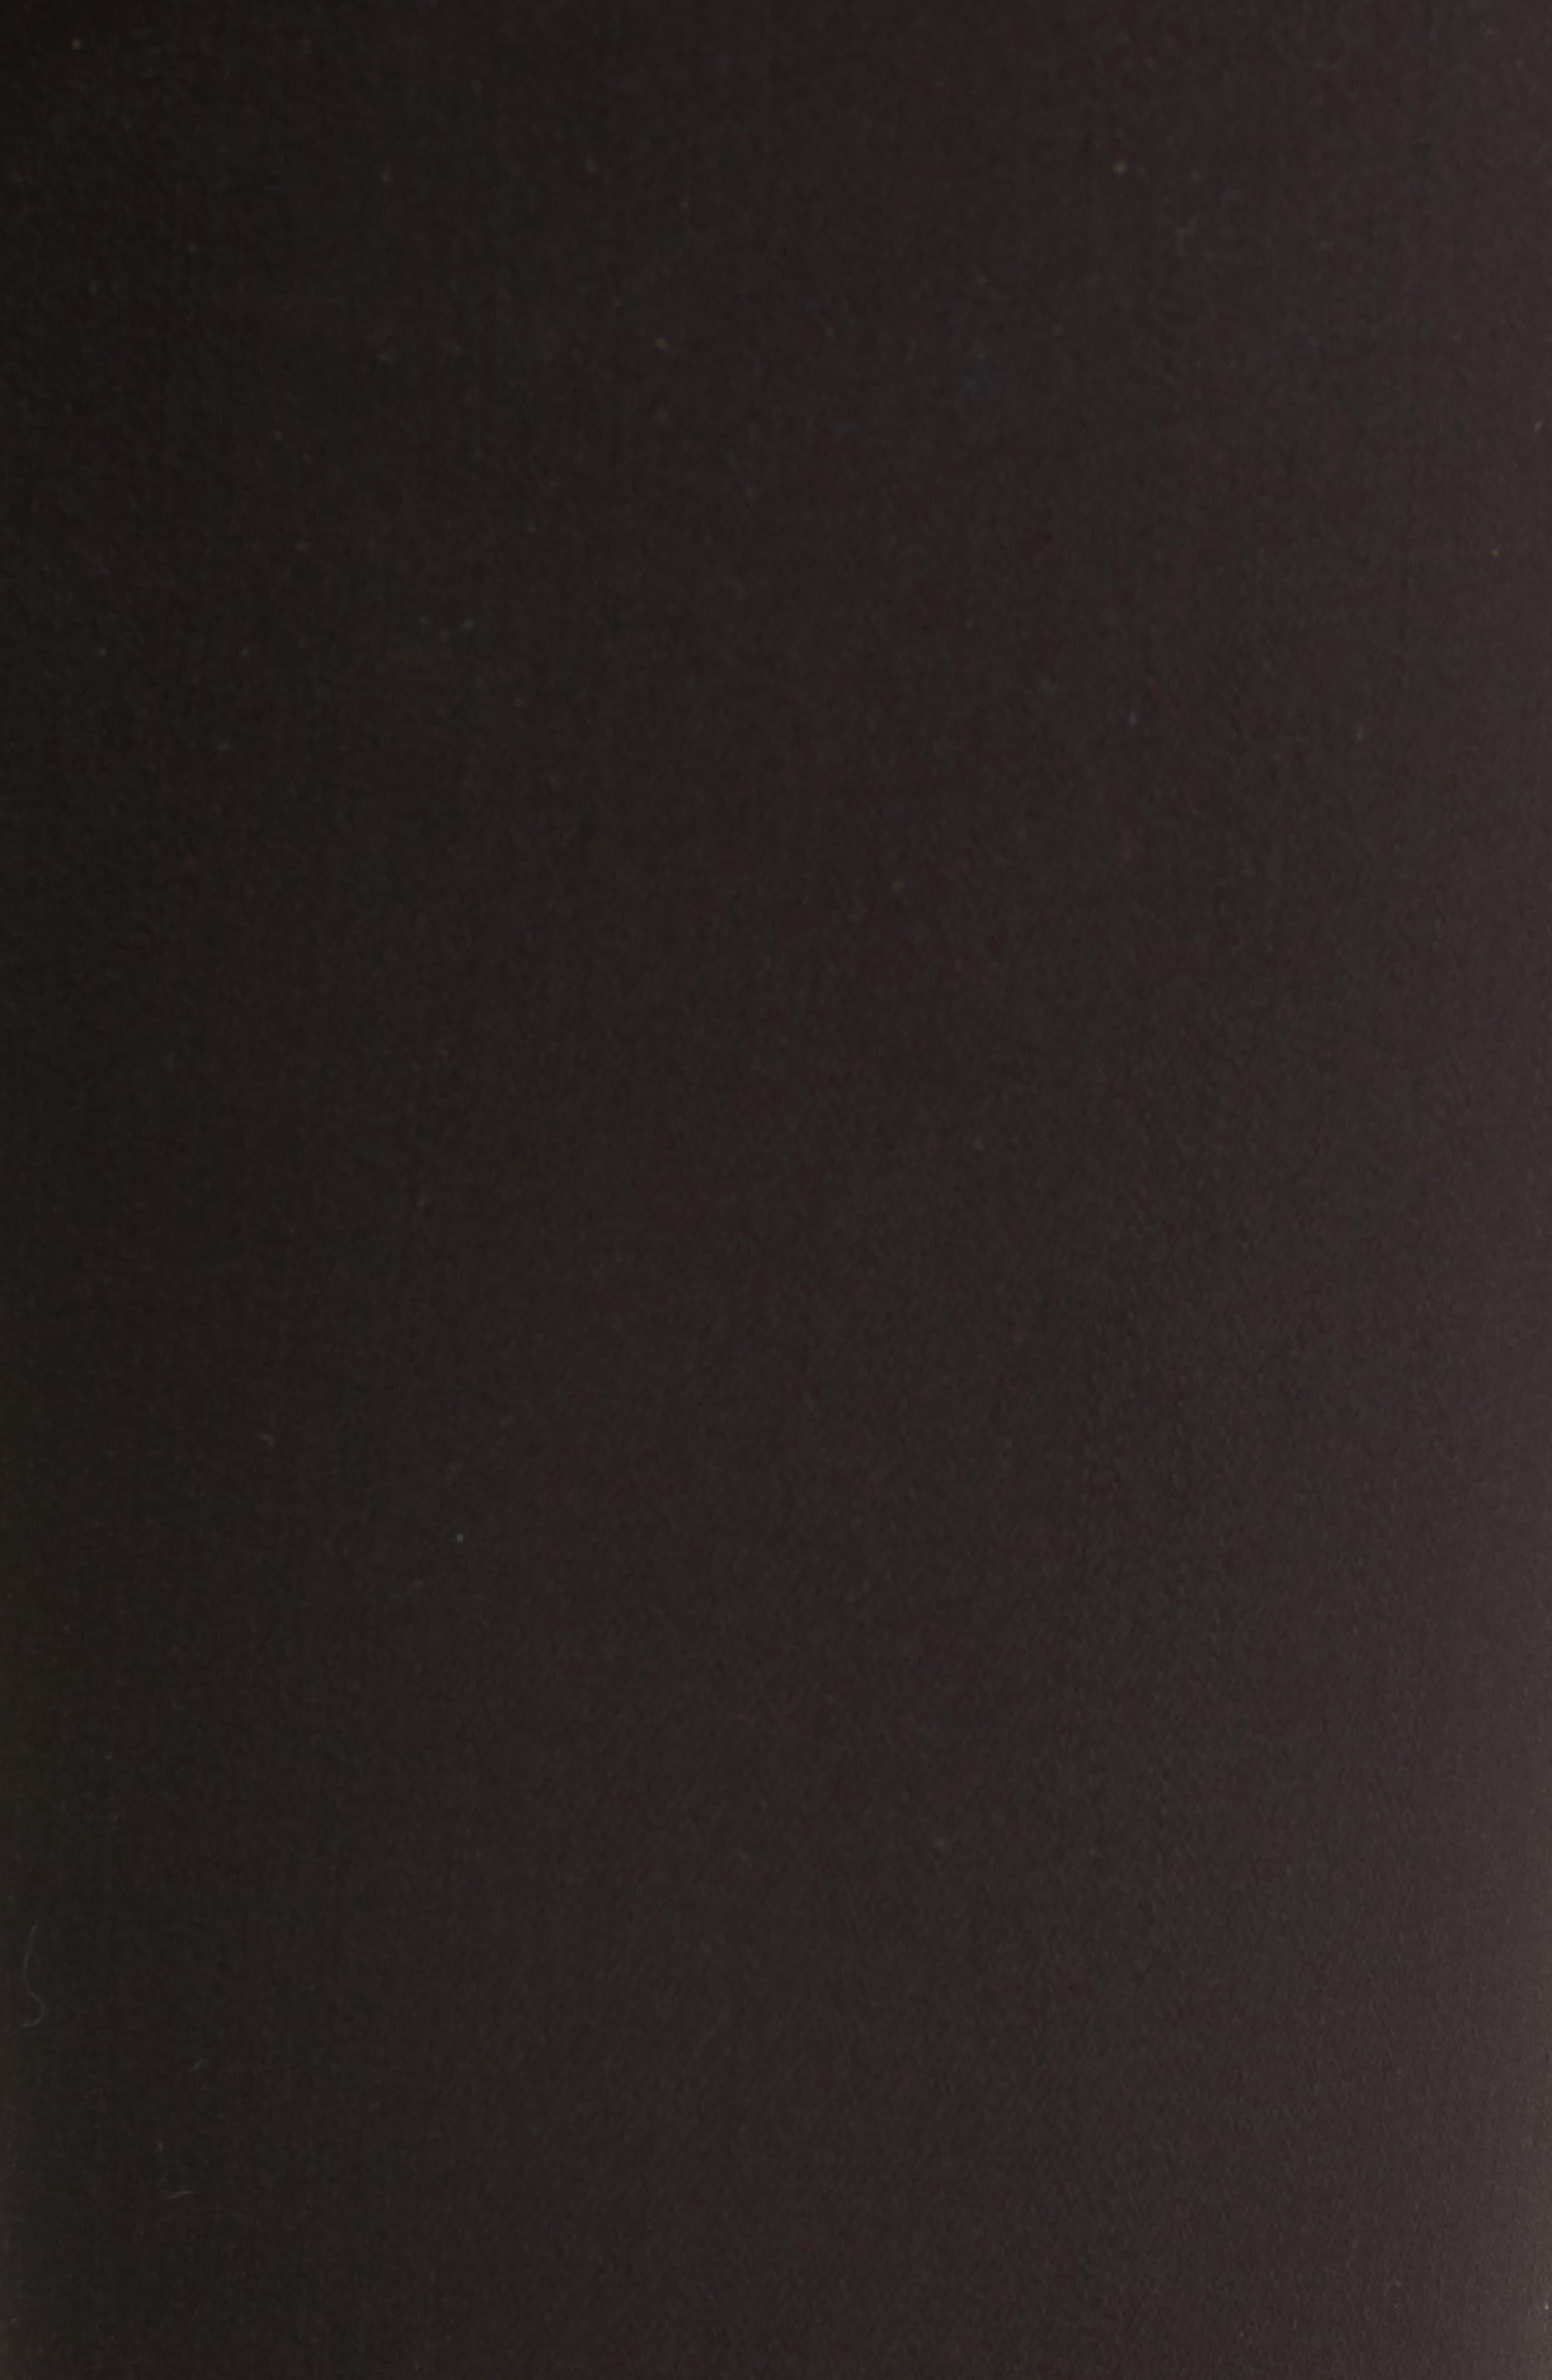 TOPSHOP, Moto 'Jamie' Ripped Skinny Jeans, Alternate thumbnail 6, color, 001